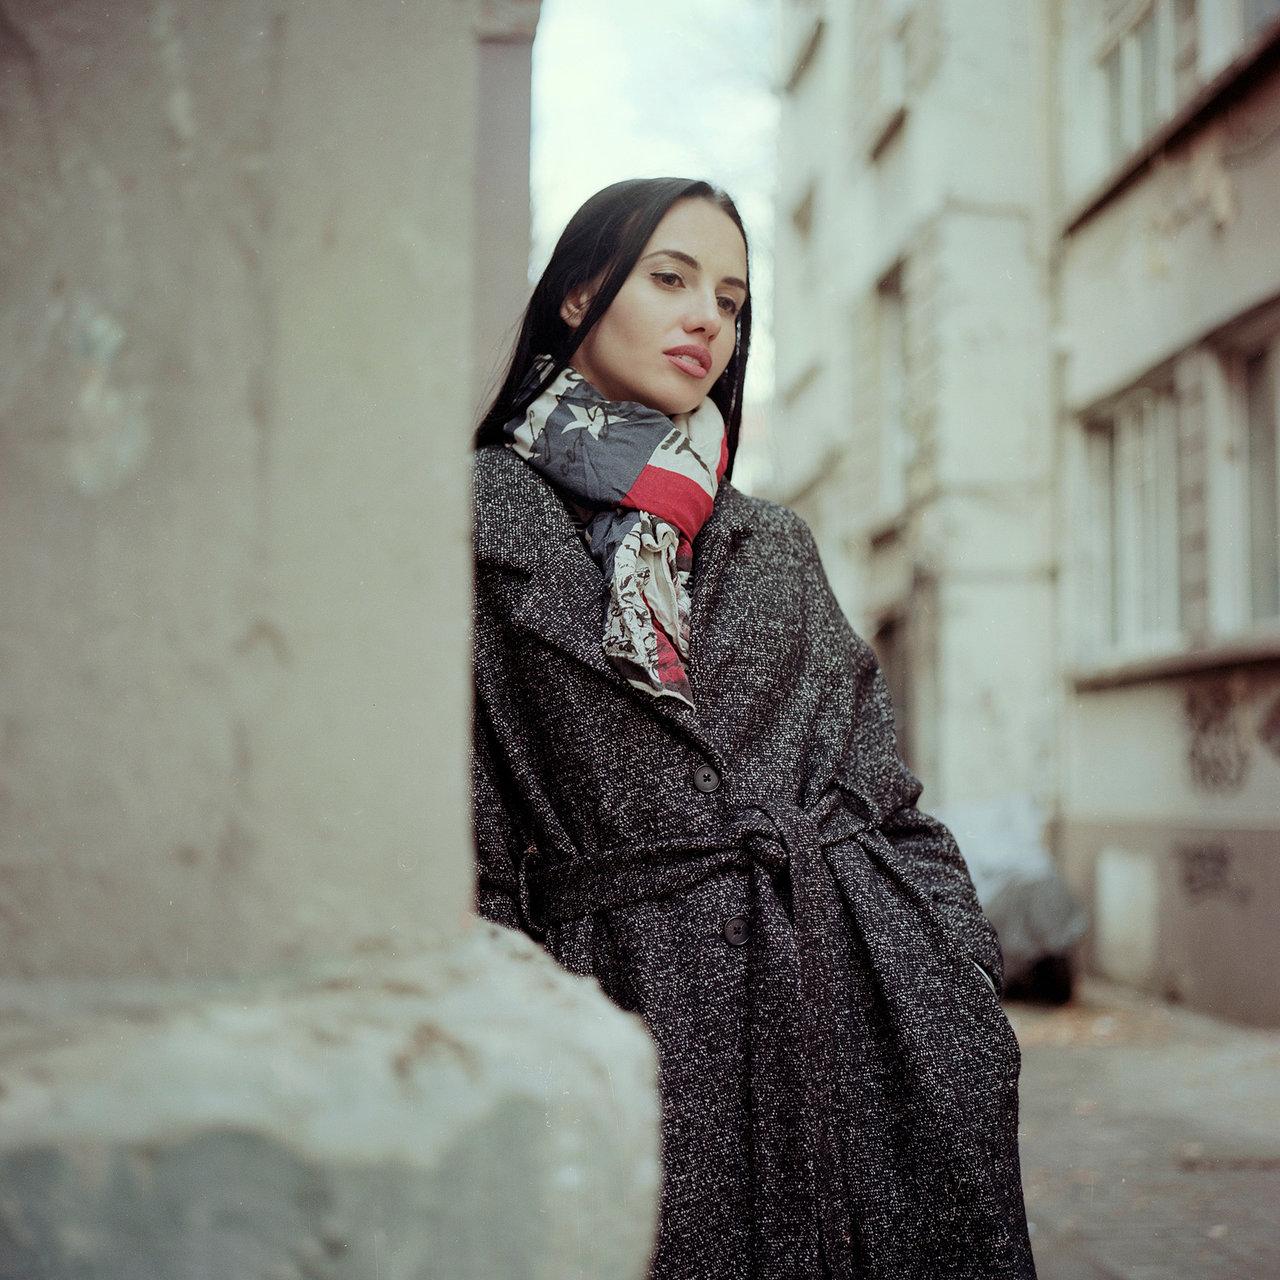 Photo in Portrait | Author corsuse | PHOTO FORUM